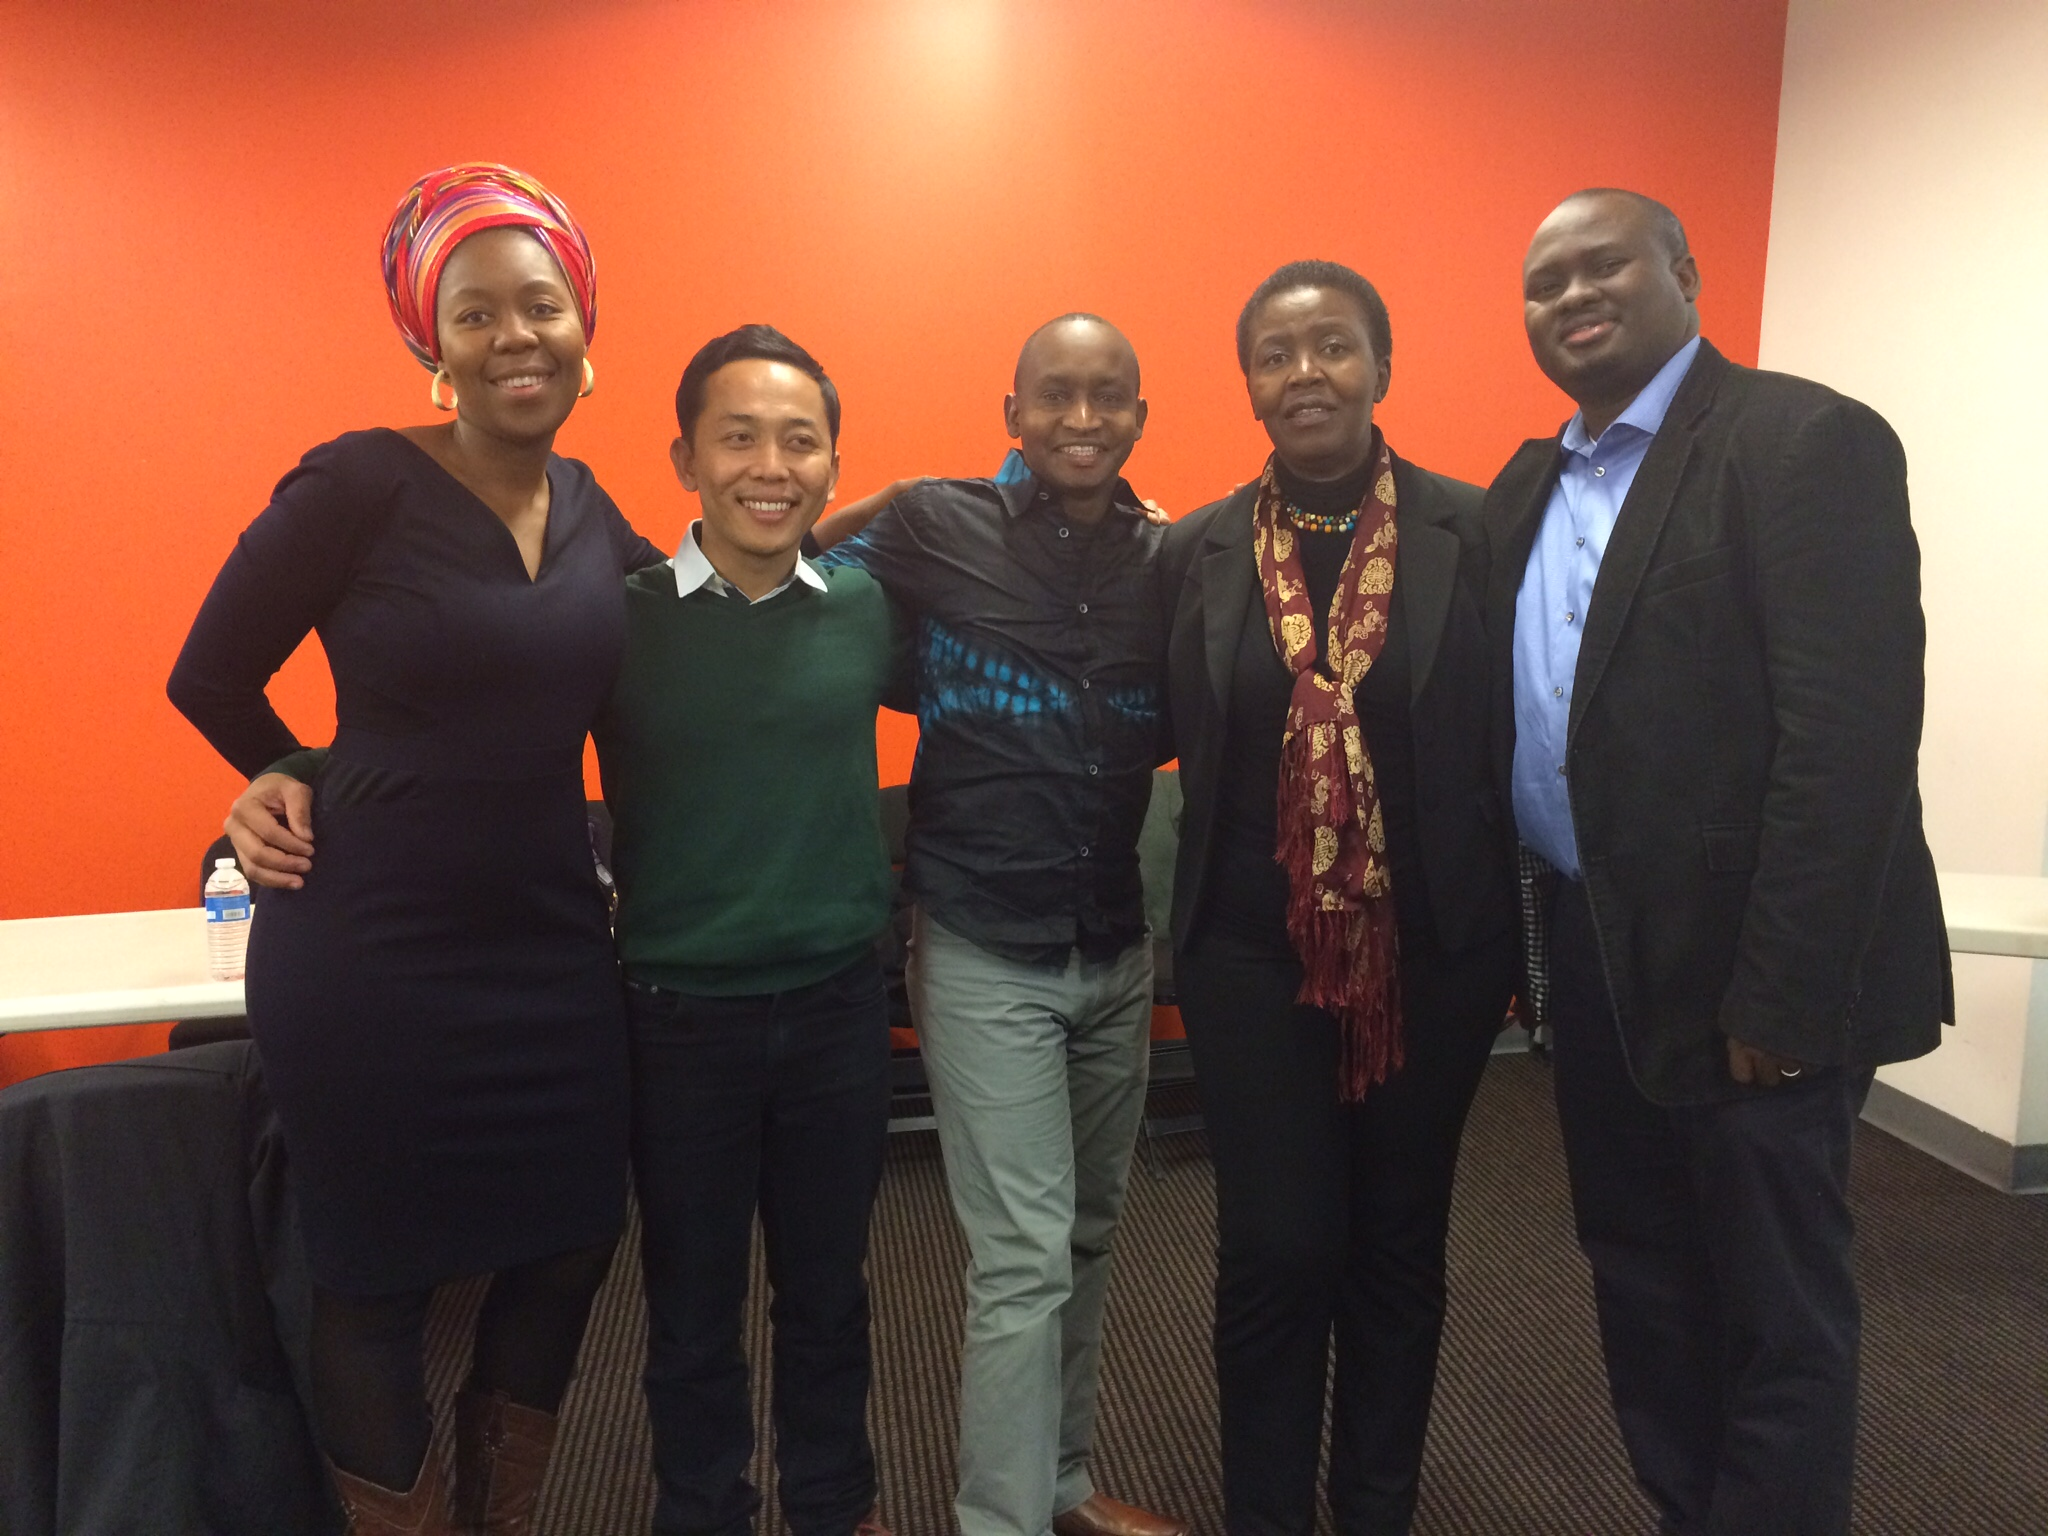 Kassaga with Aspen Institute New Voices Fellows in Washington D.C. November 2014